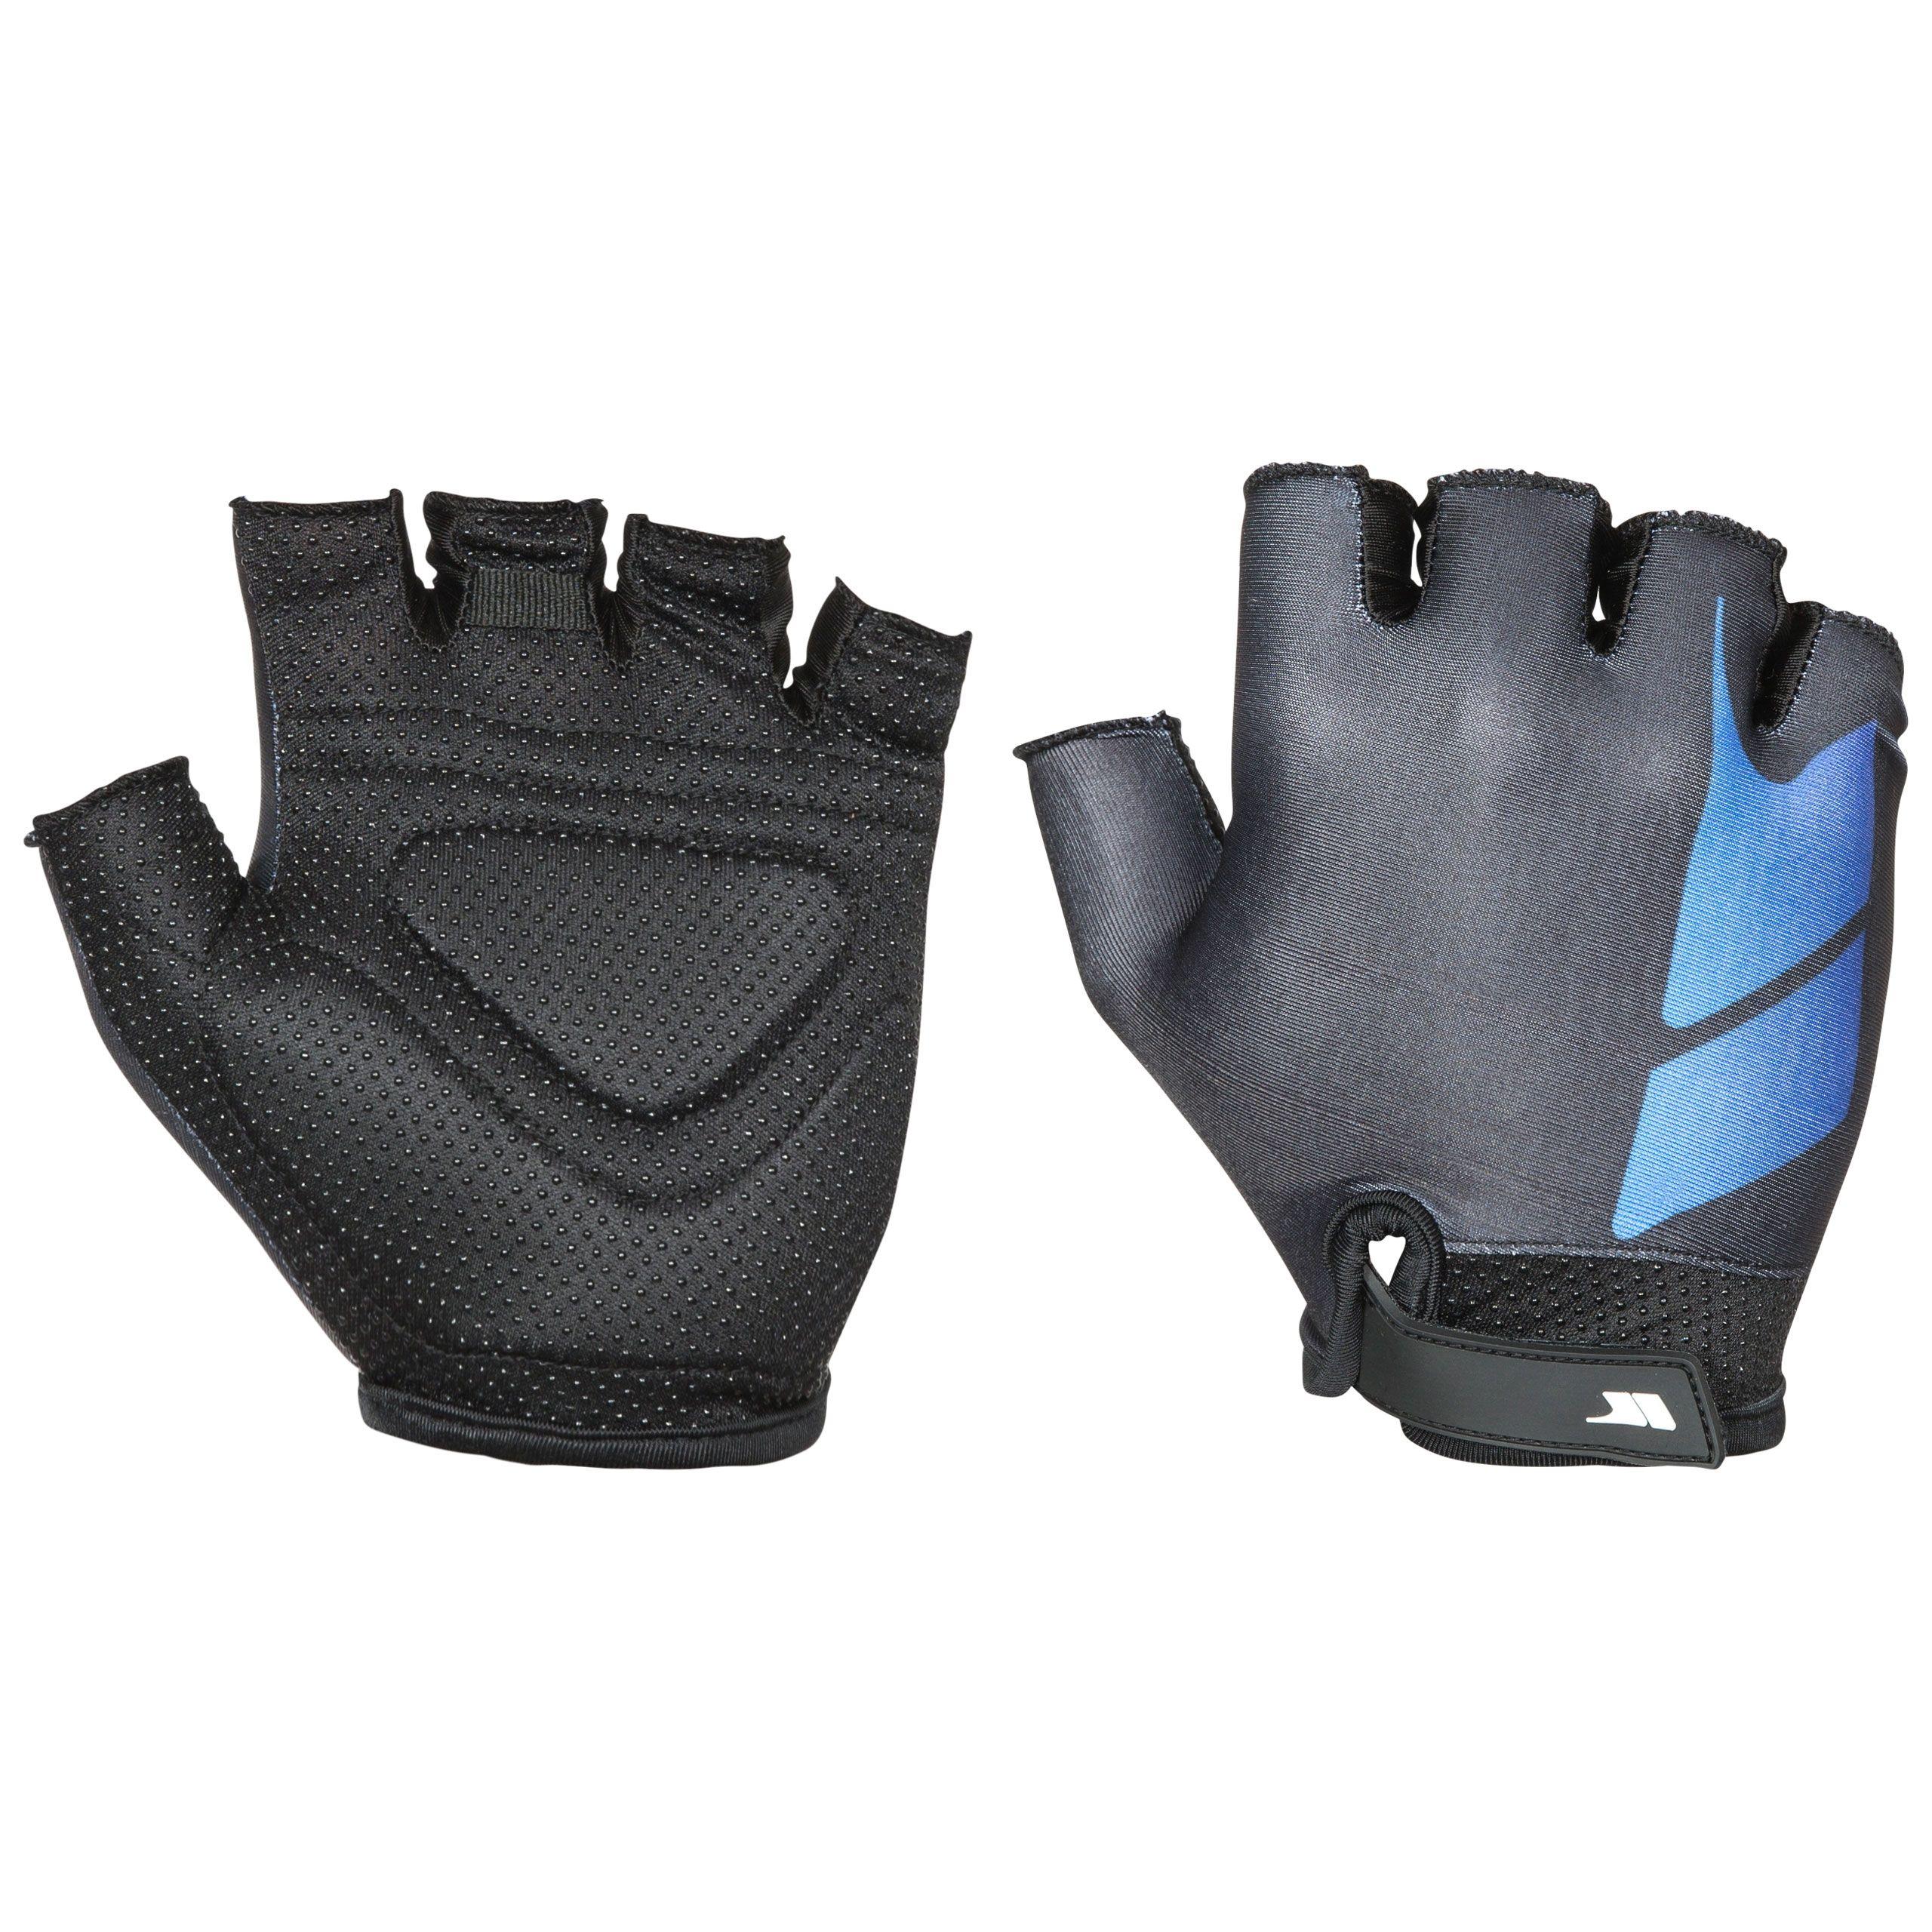 Roverek Lightly Padded Cycling Gloves